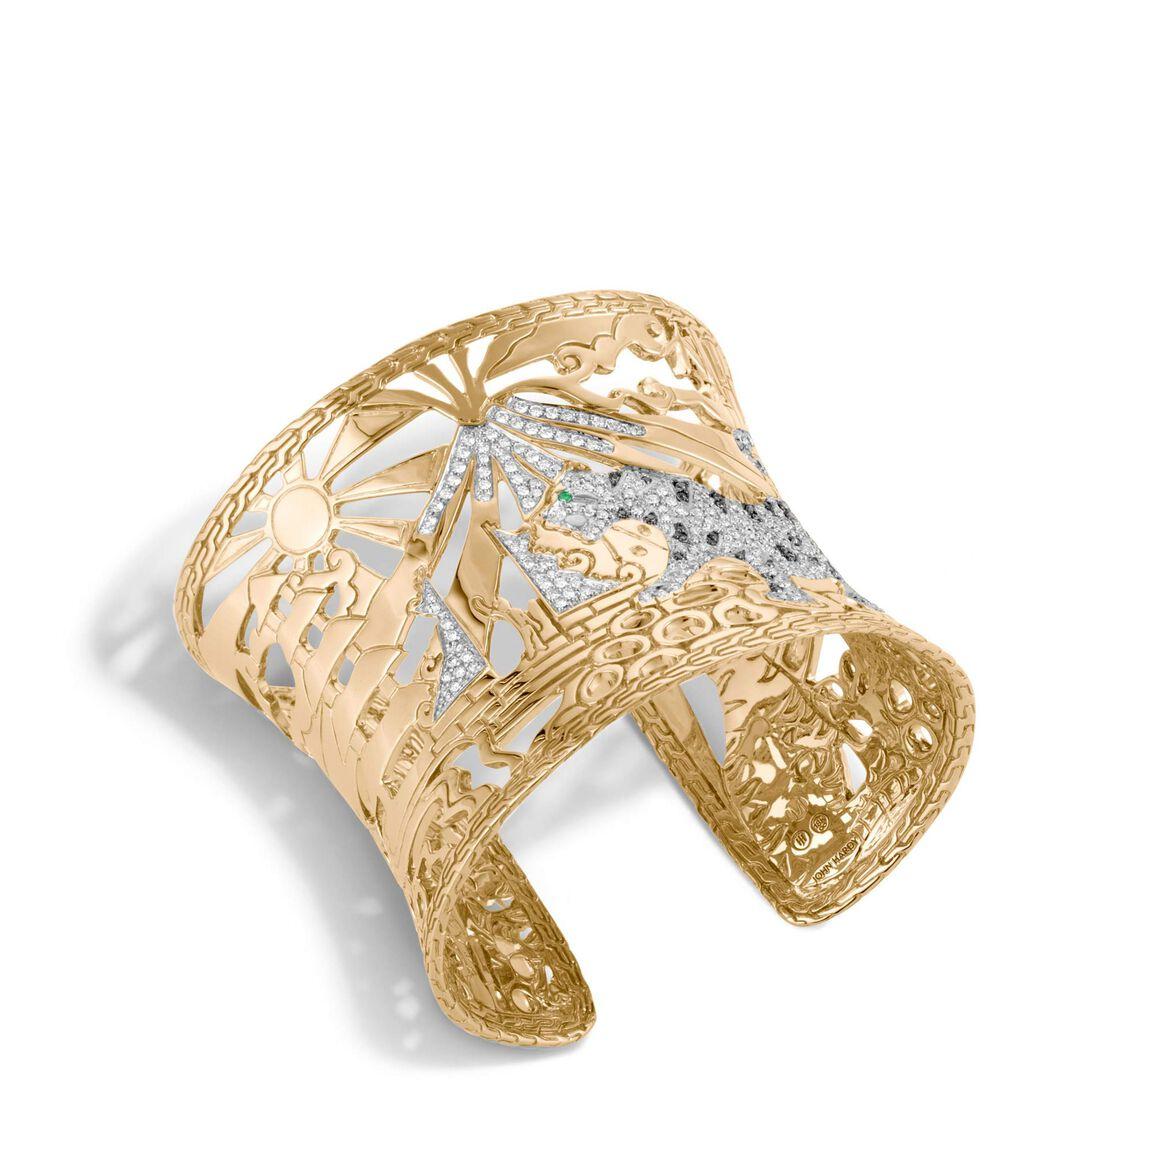 Legends Macan 72.5MM Cuff in 18K Gold with Diamonds